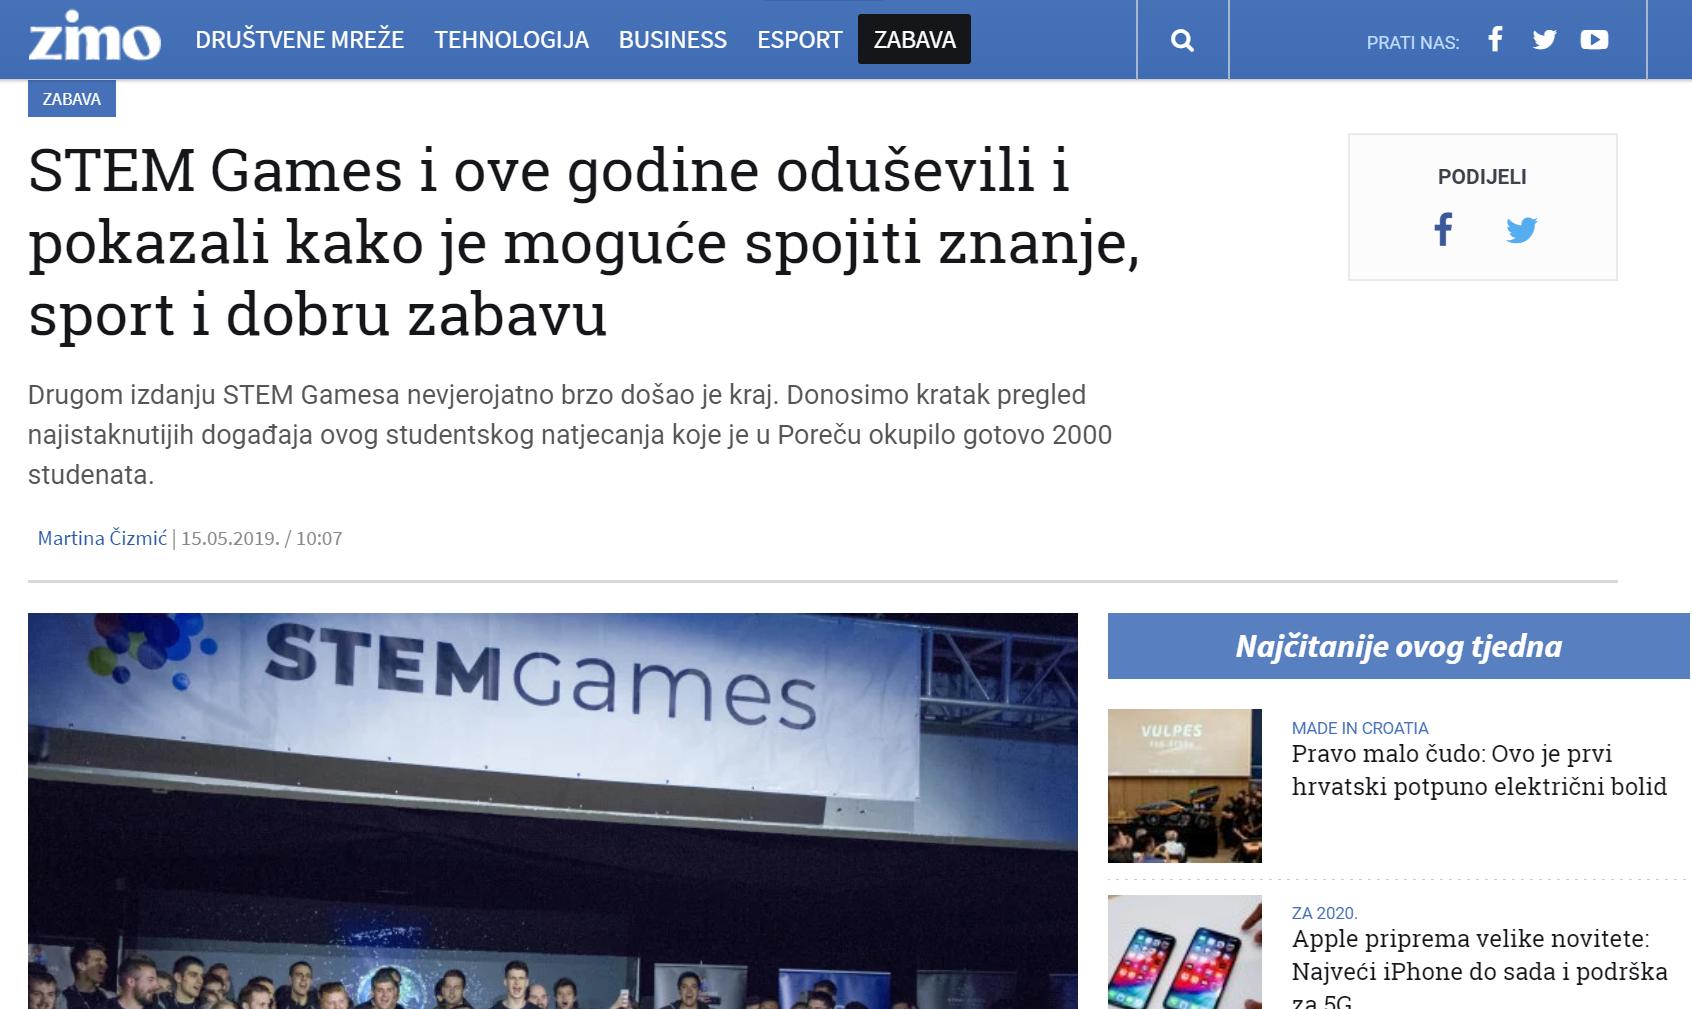 20190620 – STEM Games – Zimo zadnja objava